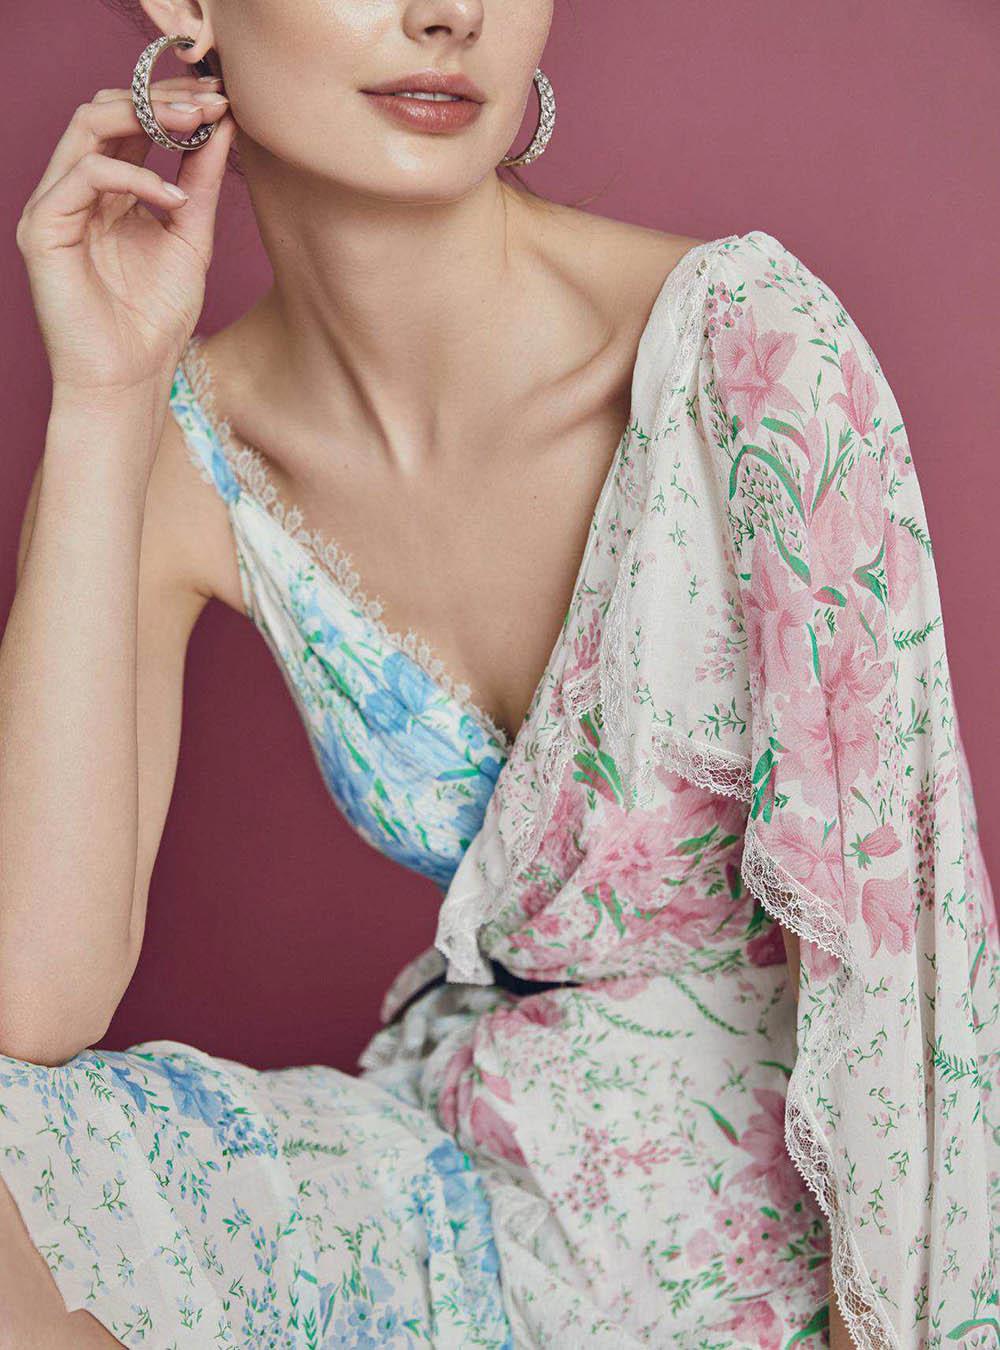 Hanna Verhees by Lara Jade for Harper's Bazaar UK May 2018